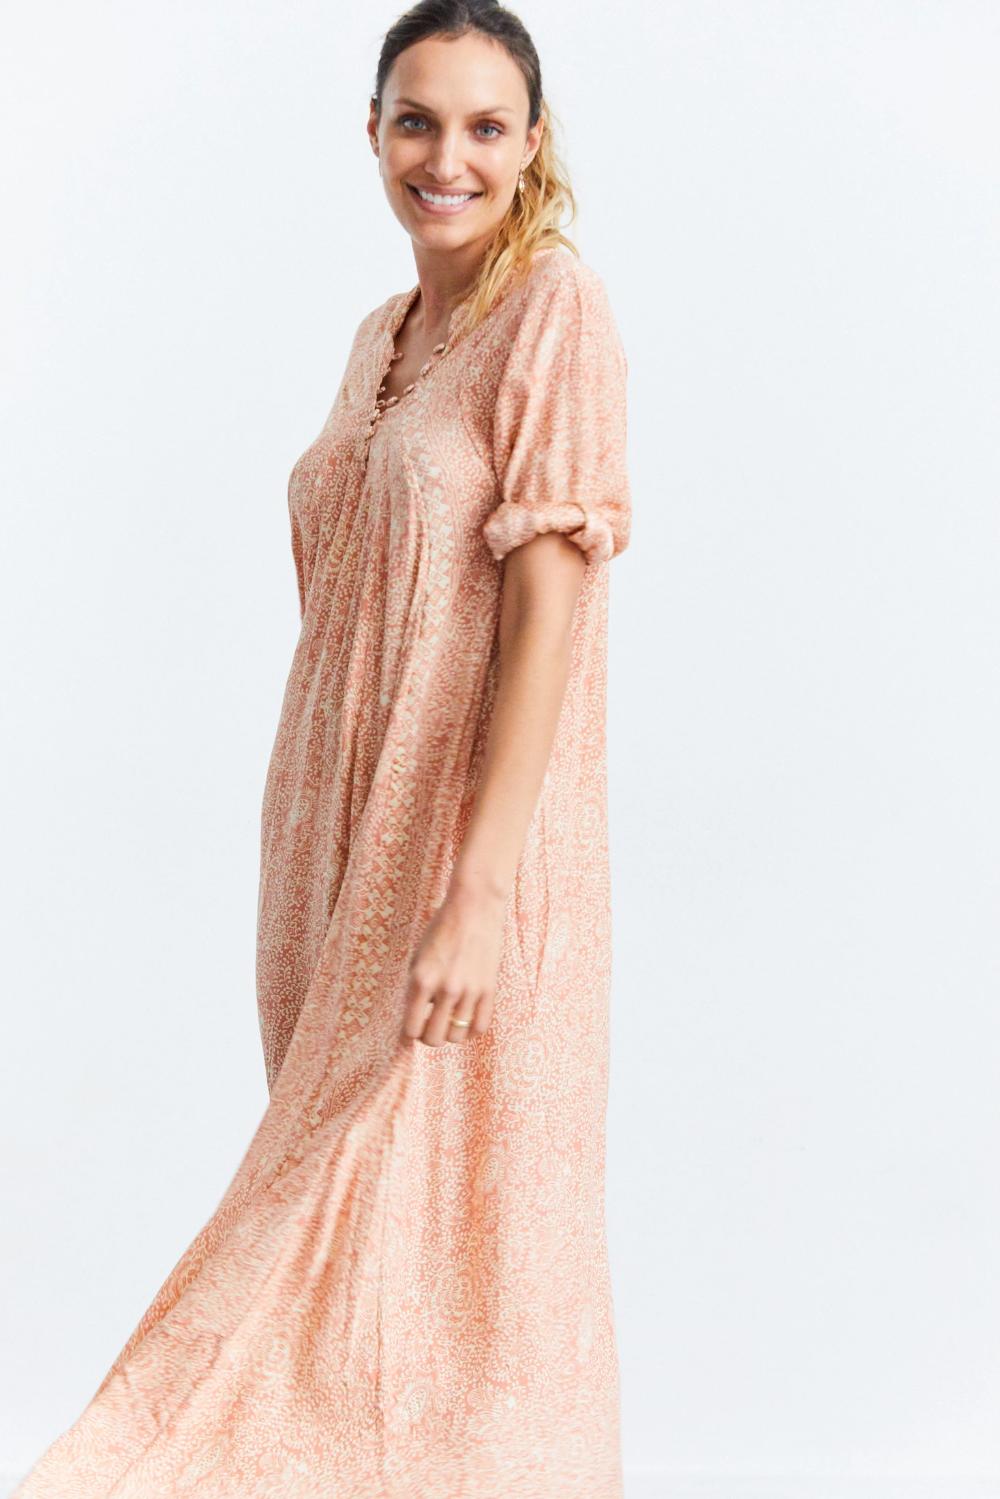 Natalie Martin Fiore Maxi Dress In Dune At Sunroom Dresses Simple Dresses Maxi Dress [ 1499 x 1000 Pixel ]